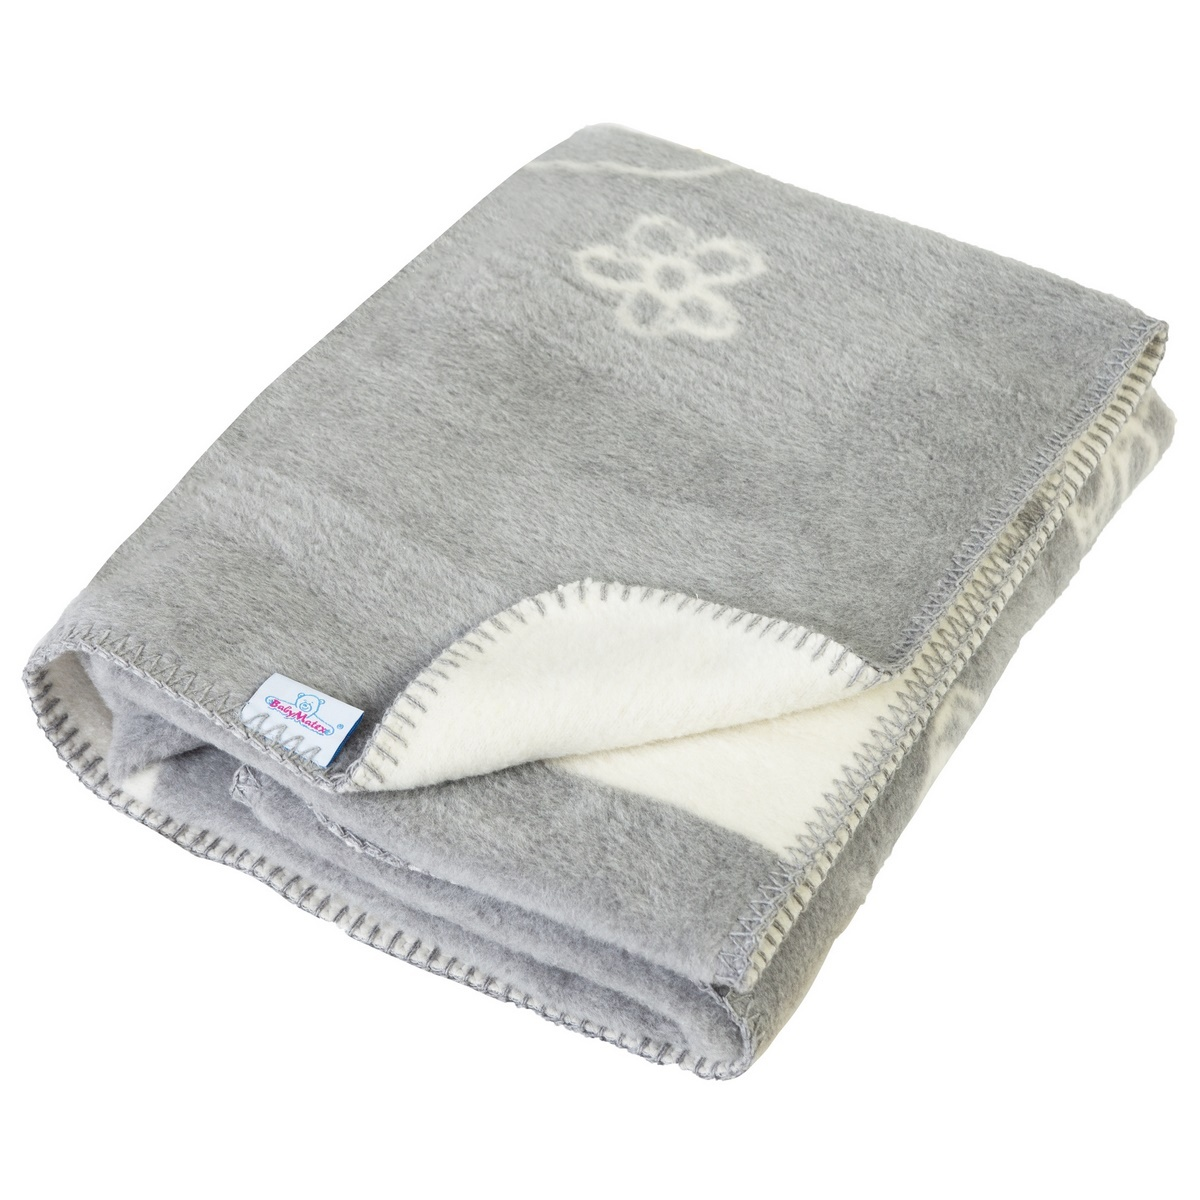 Dětská deka Teddy šedá, 75 x 100 cm